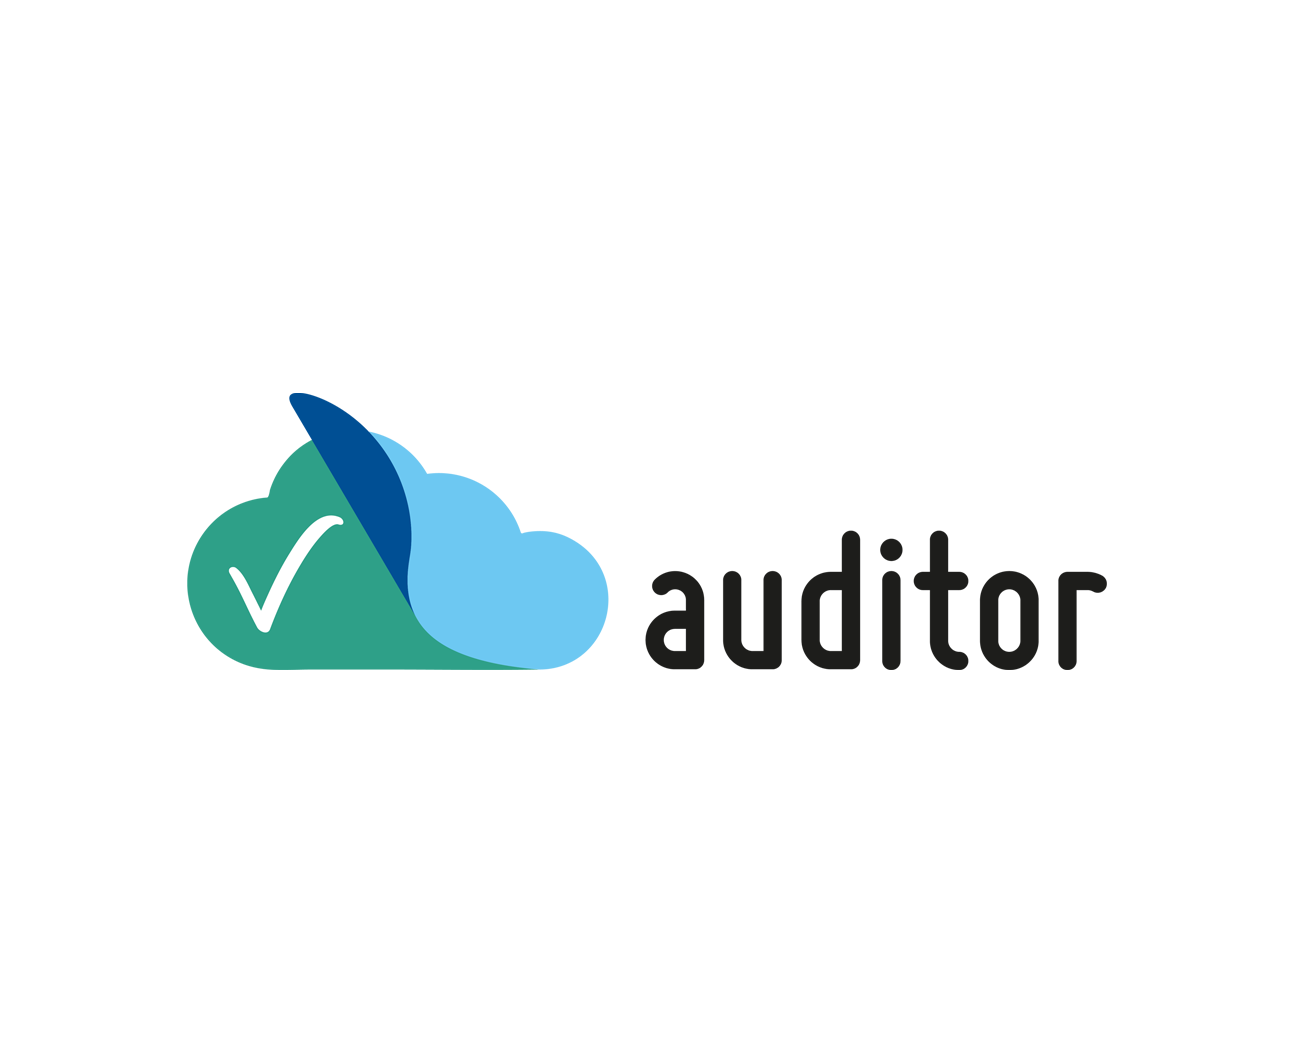 www.auditor-cert.de